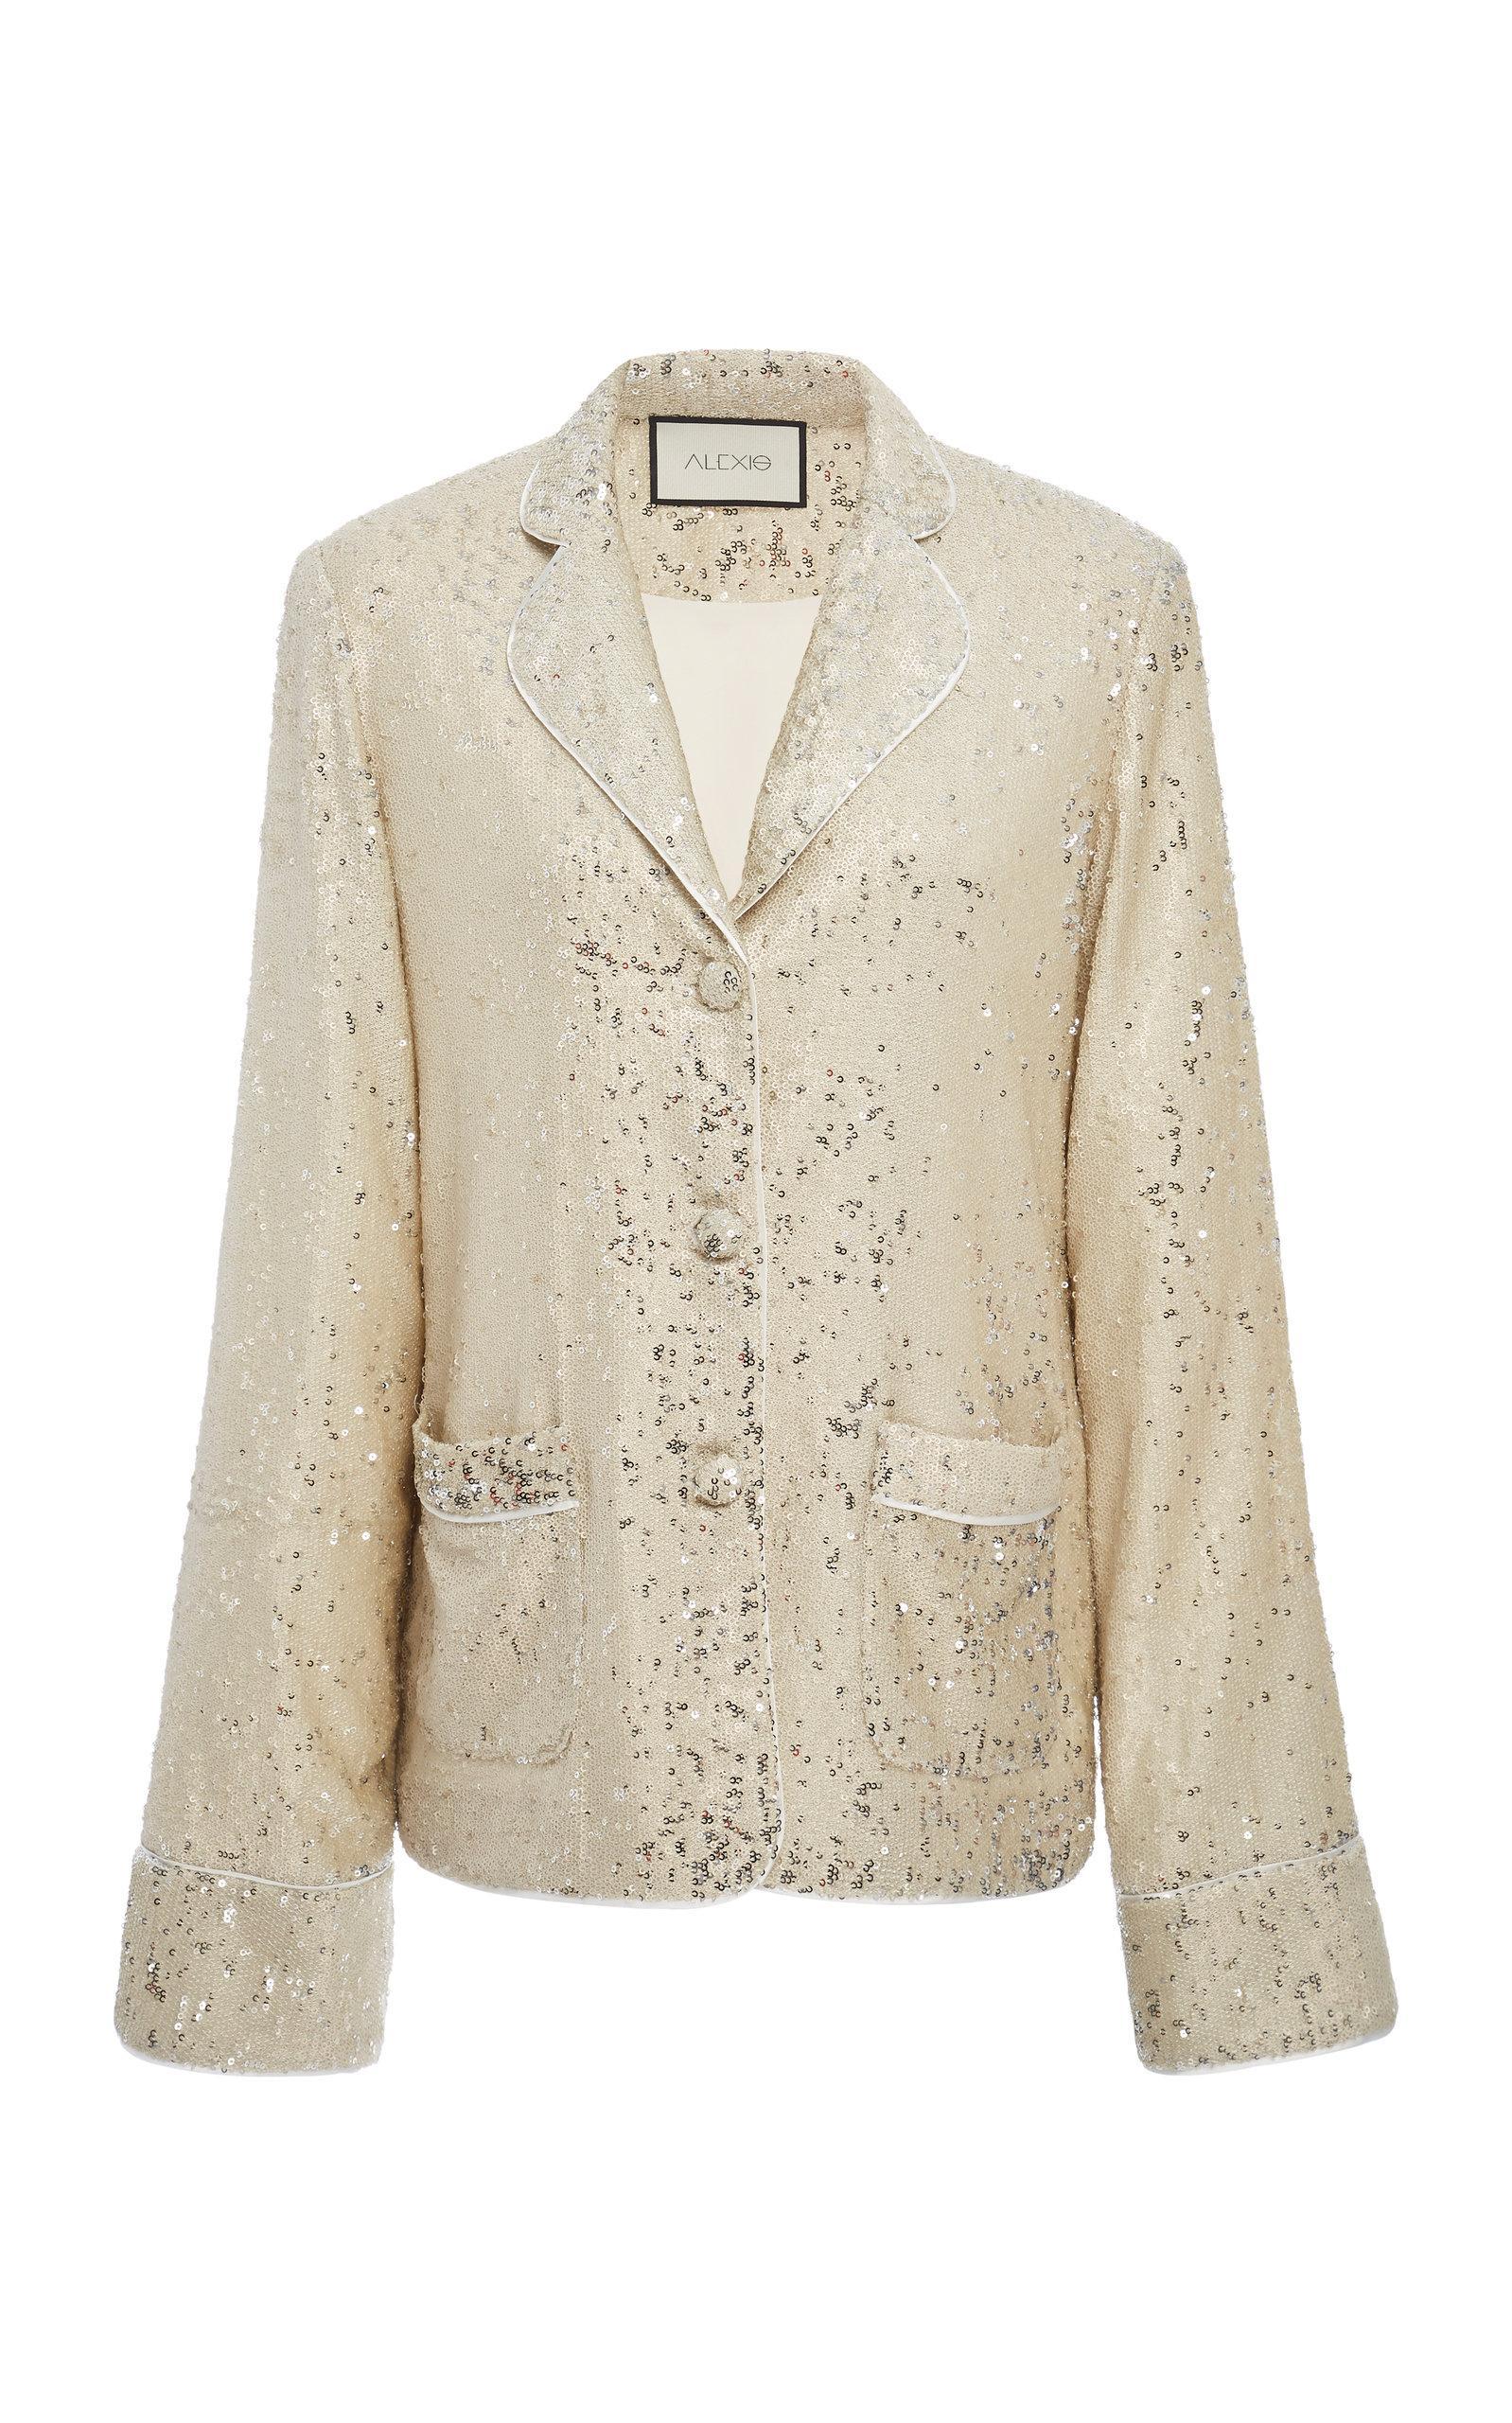 ebc65fe63f85 Alexis Ripley Sequin Jacket In White | ModeSens